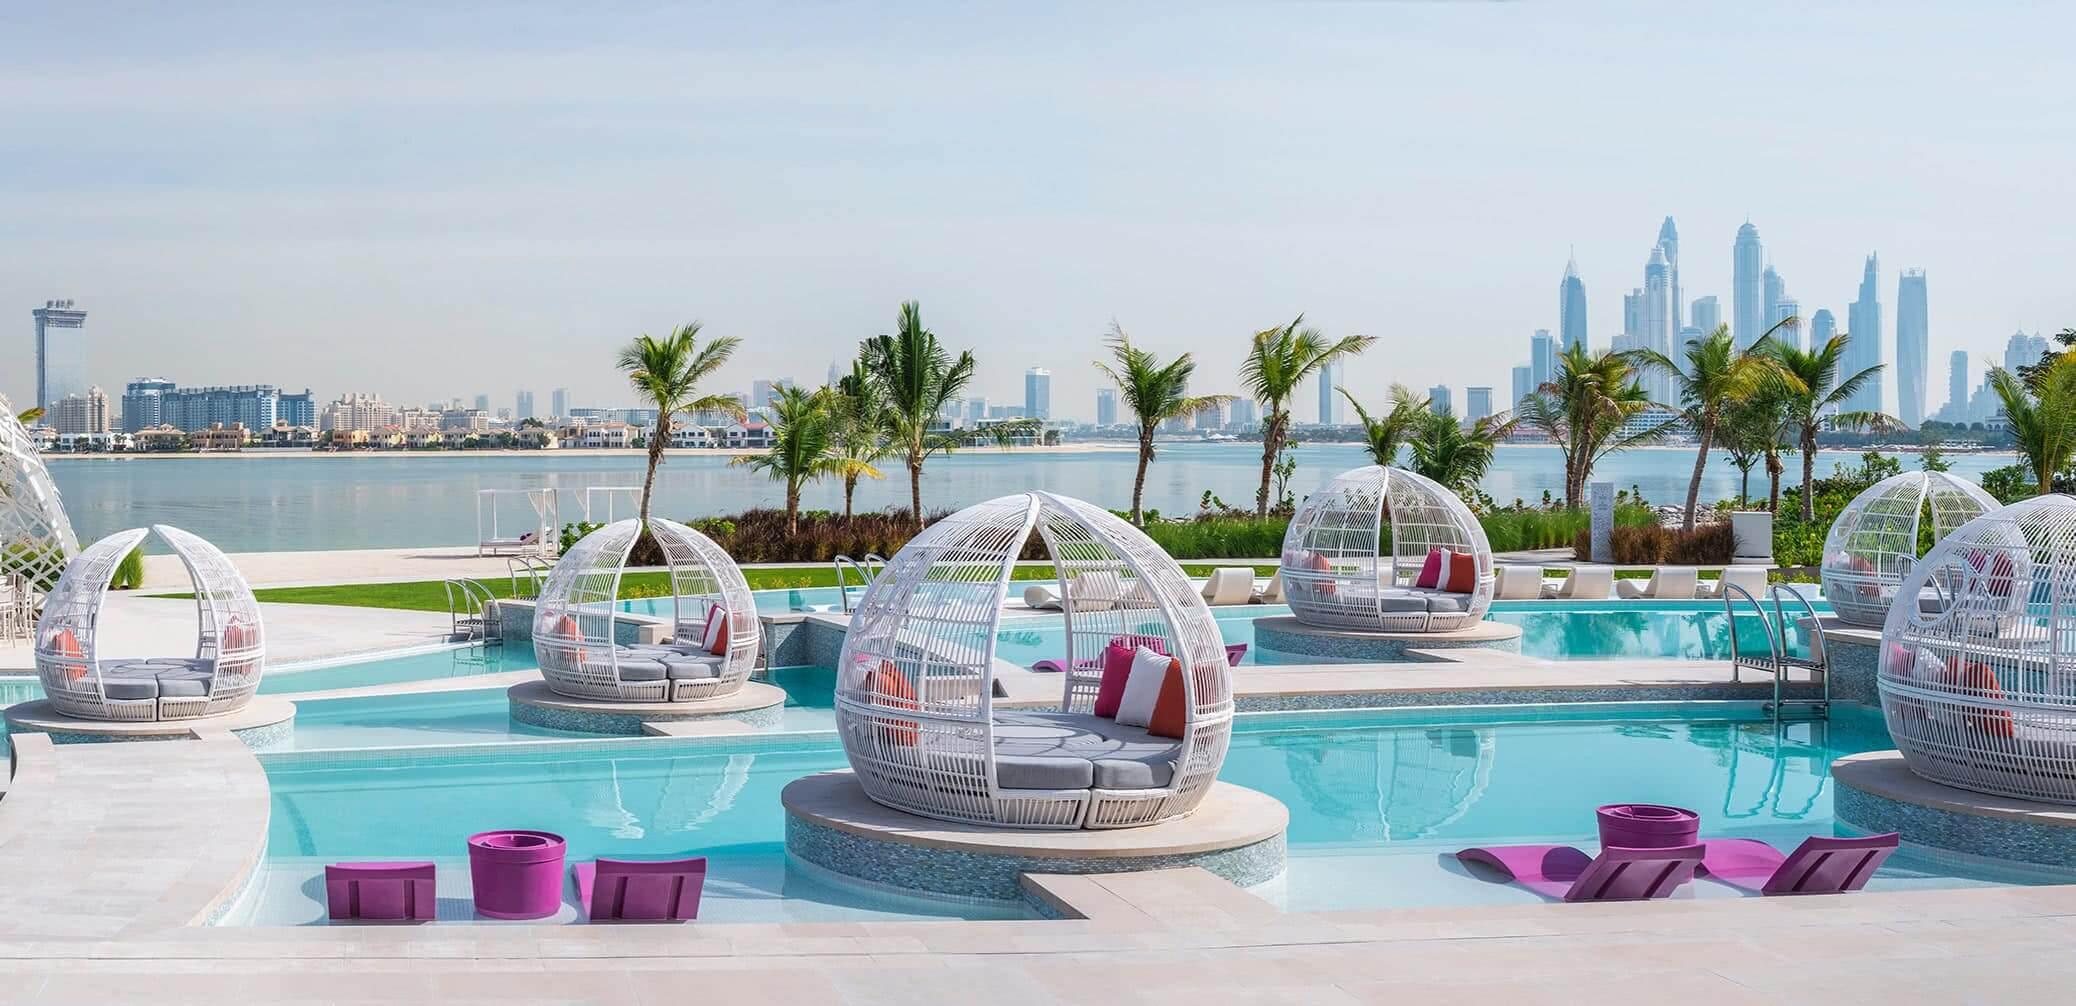 piscina hotel dubai vivirendubai